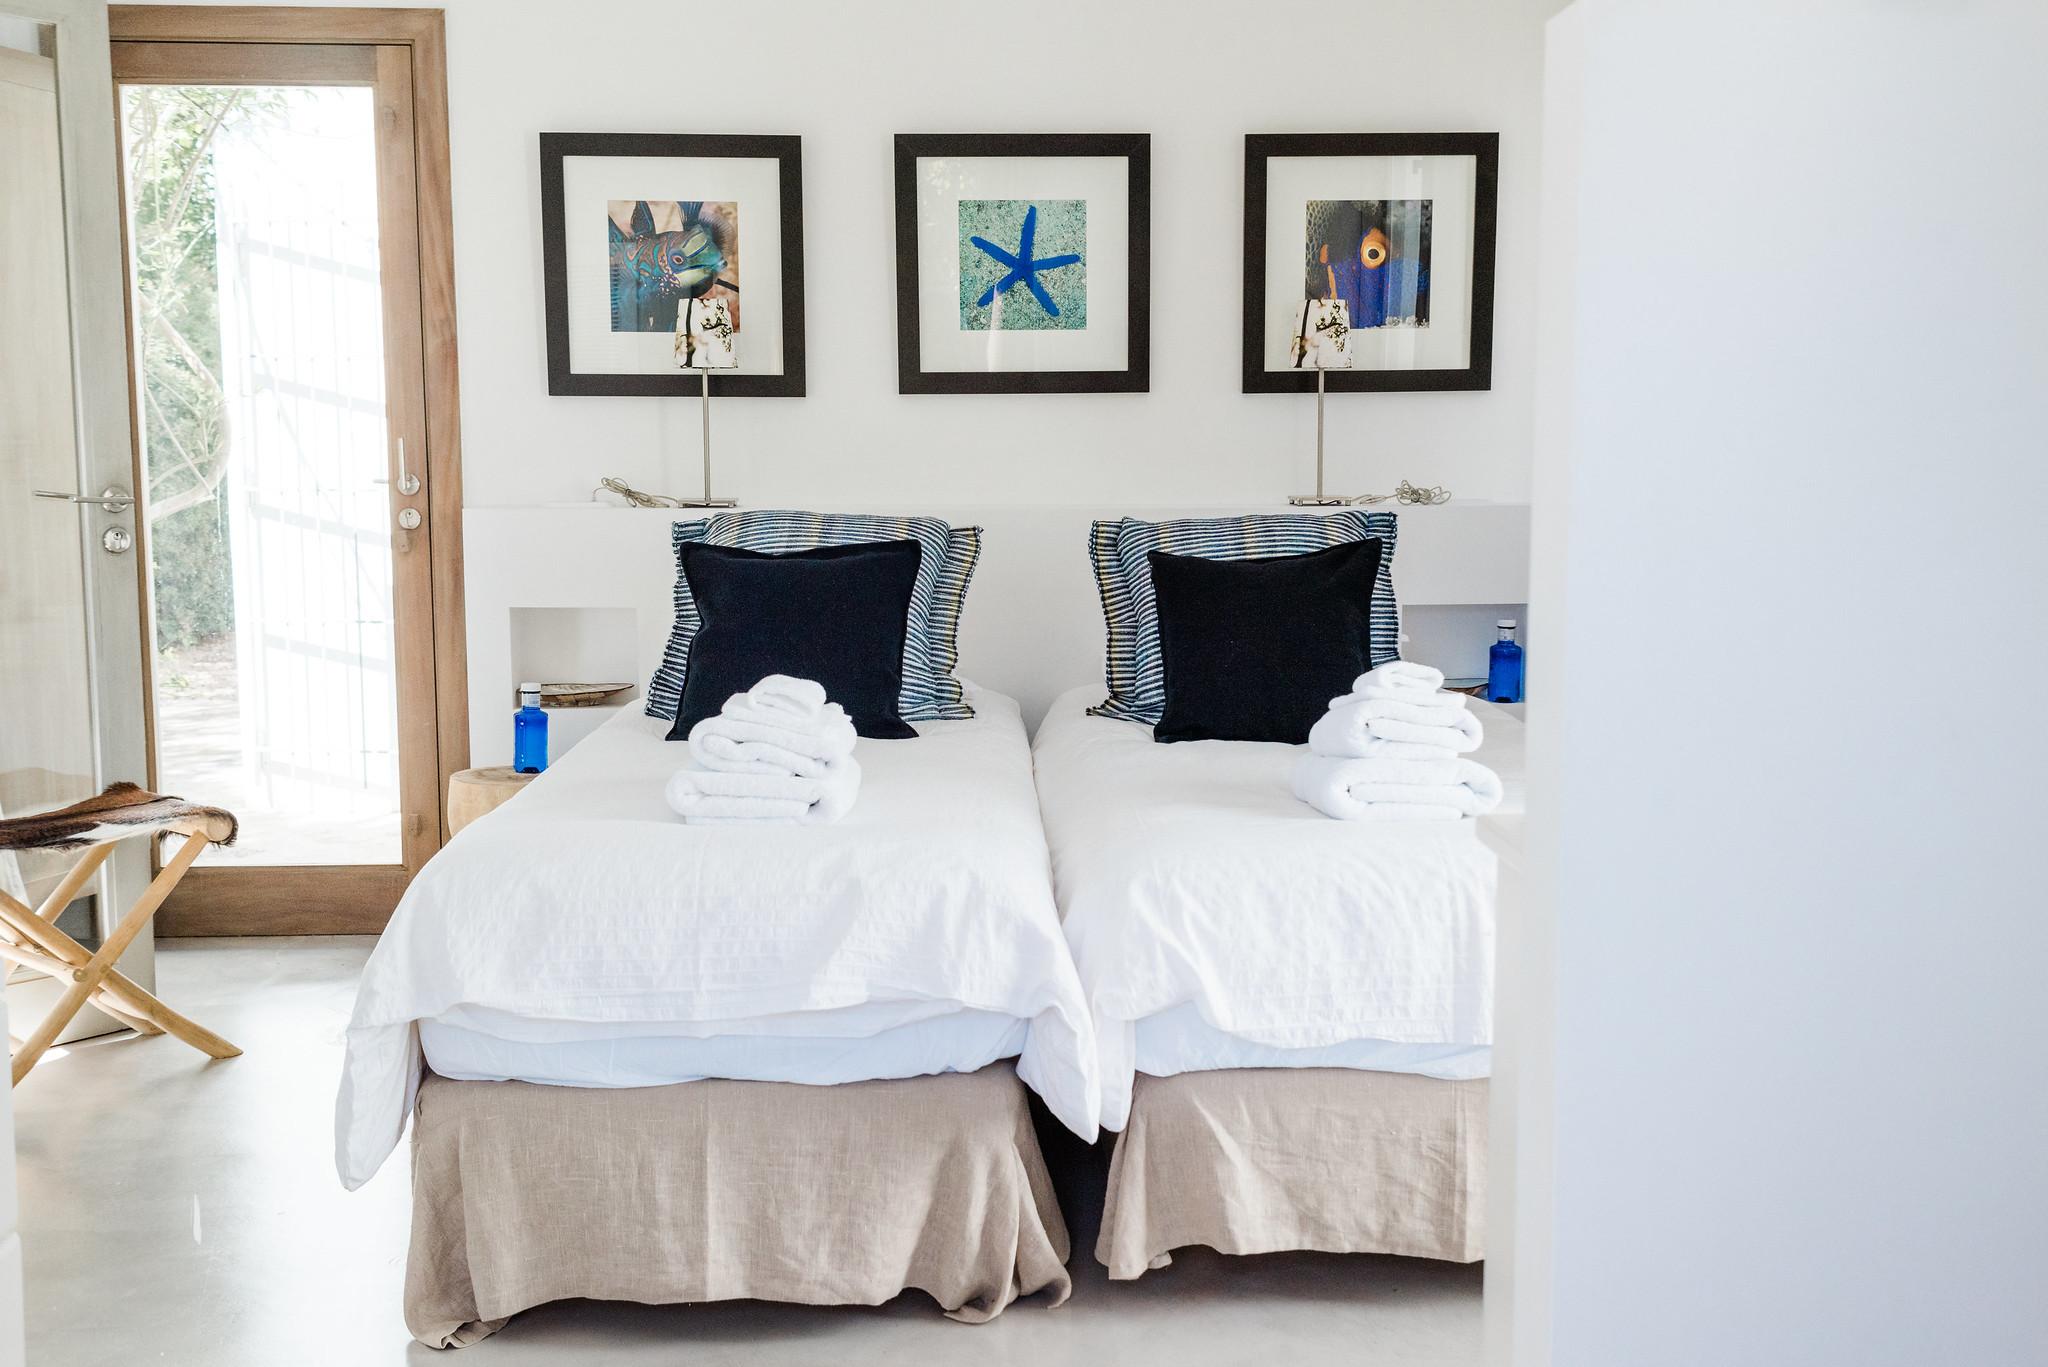 https://www.white-ibiza.com/wp-content/uploads/2020/06/white-ibiza-villas-casa-nyah-interior-bedroom3.jpg